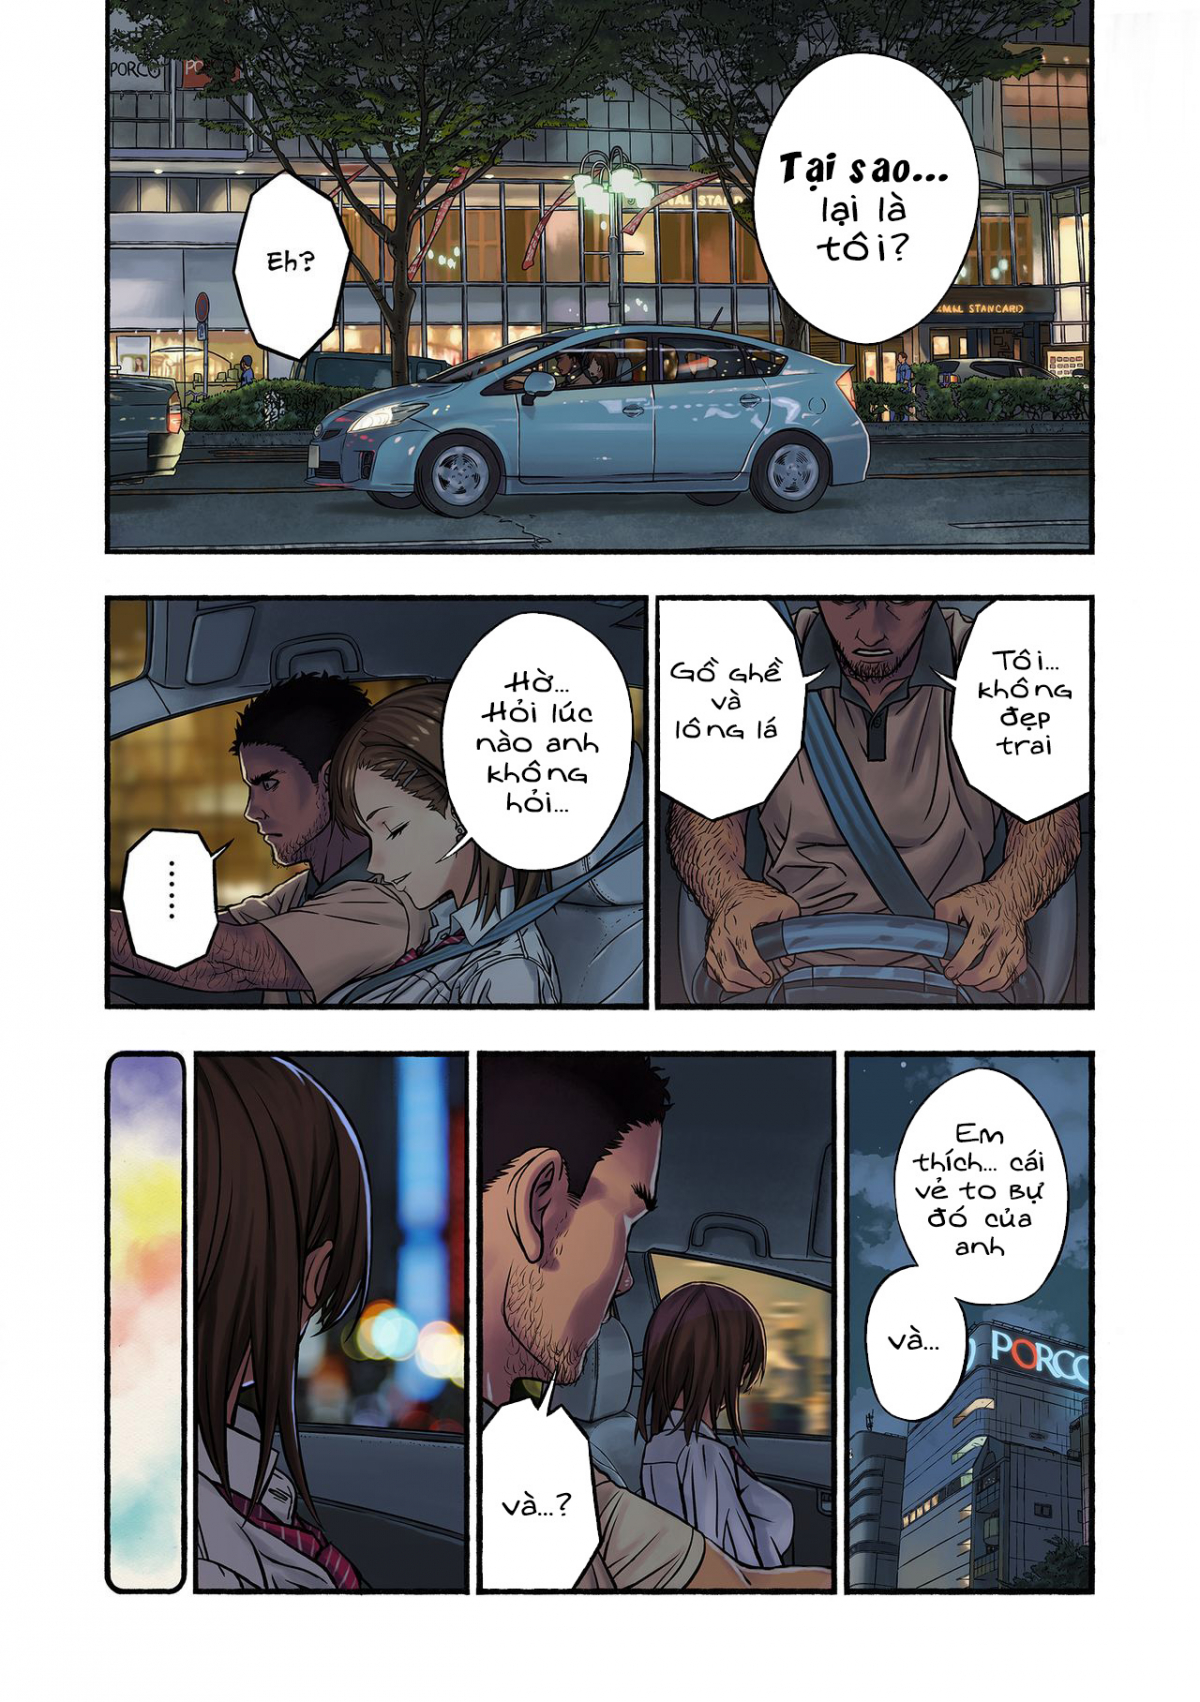 HentaiVN.net - Ảnh 16 - Chinatsu to Kuma-chan Sensei - Chinatsu và Anh Thầy Gấu Bự; 千夏と熊ちゃん先生 - Oneshot